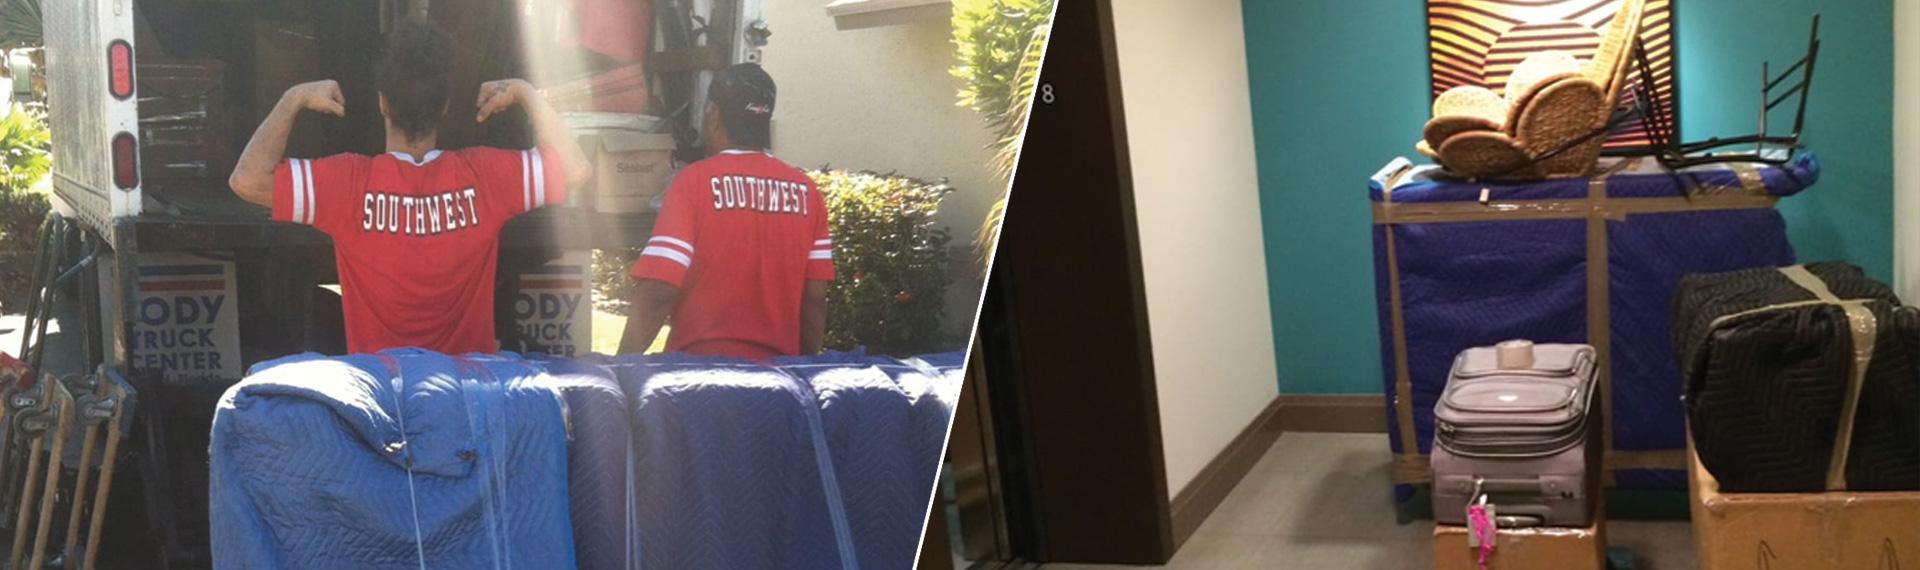 South West Movers Santa Clara CA